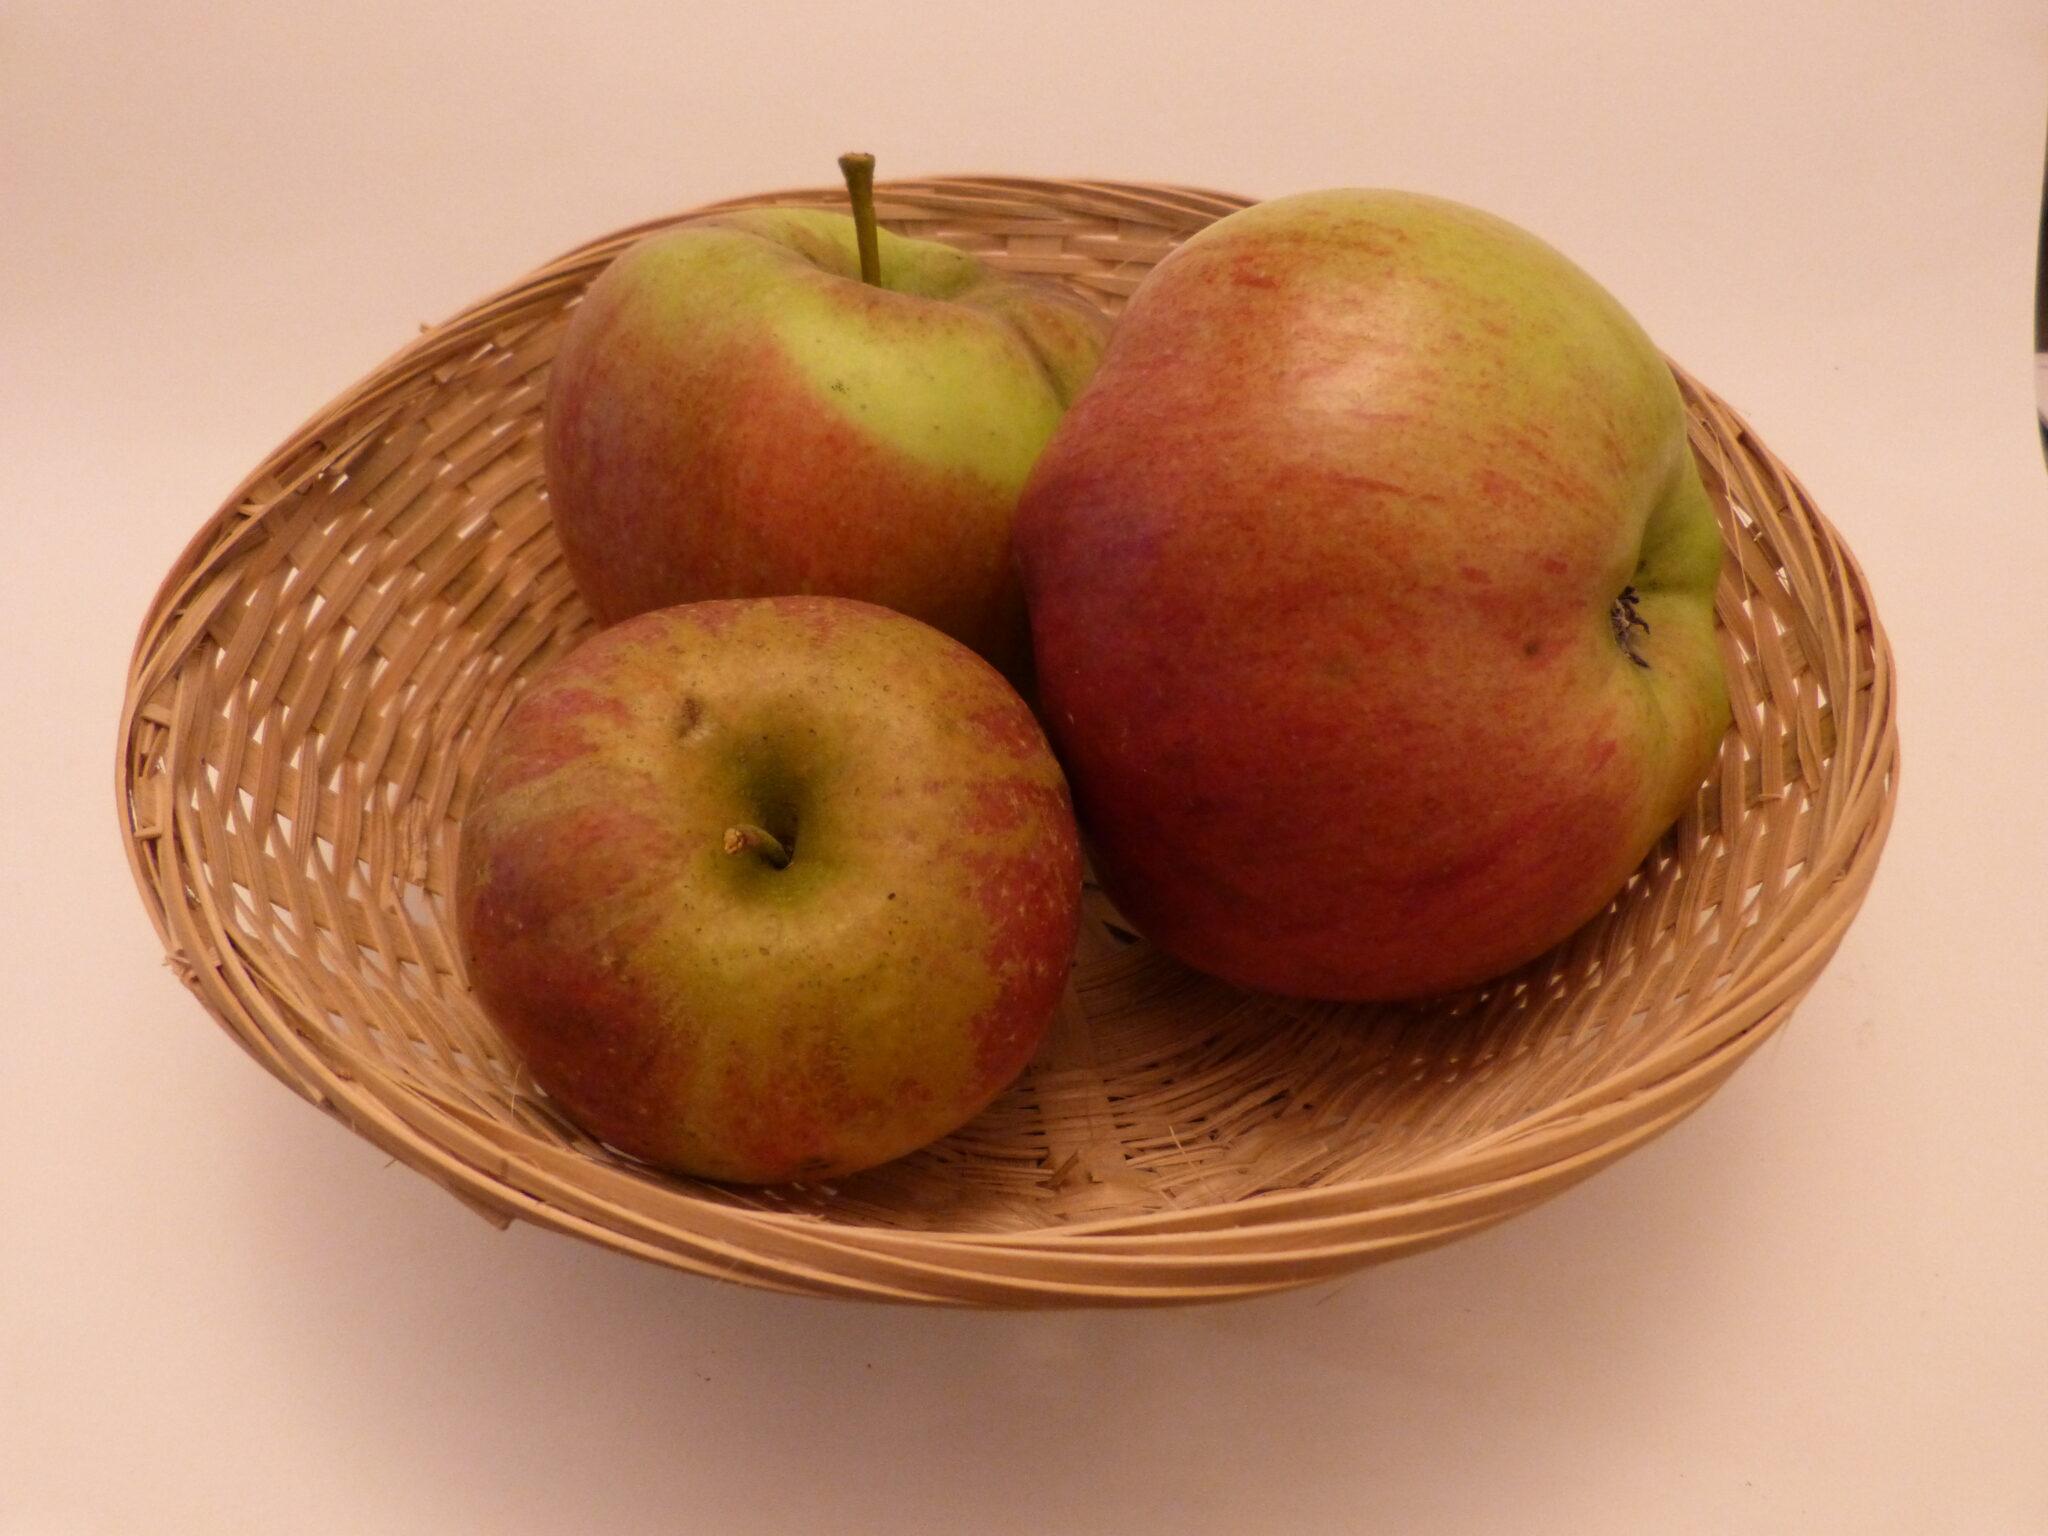 Calville Couturier (fruit).